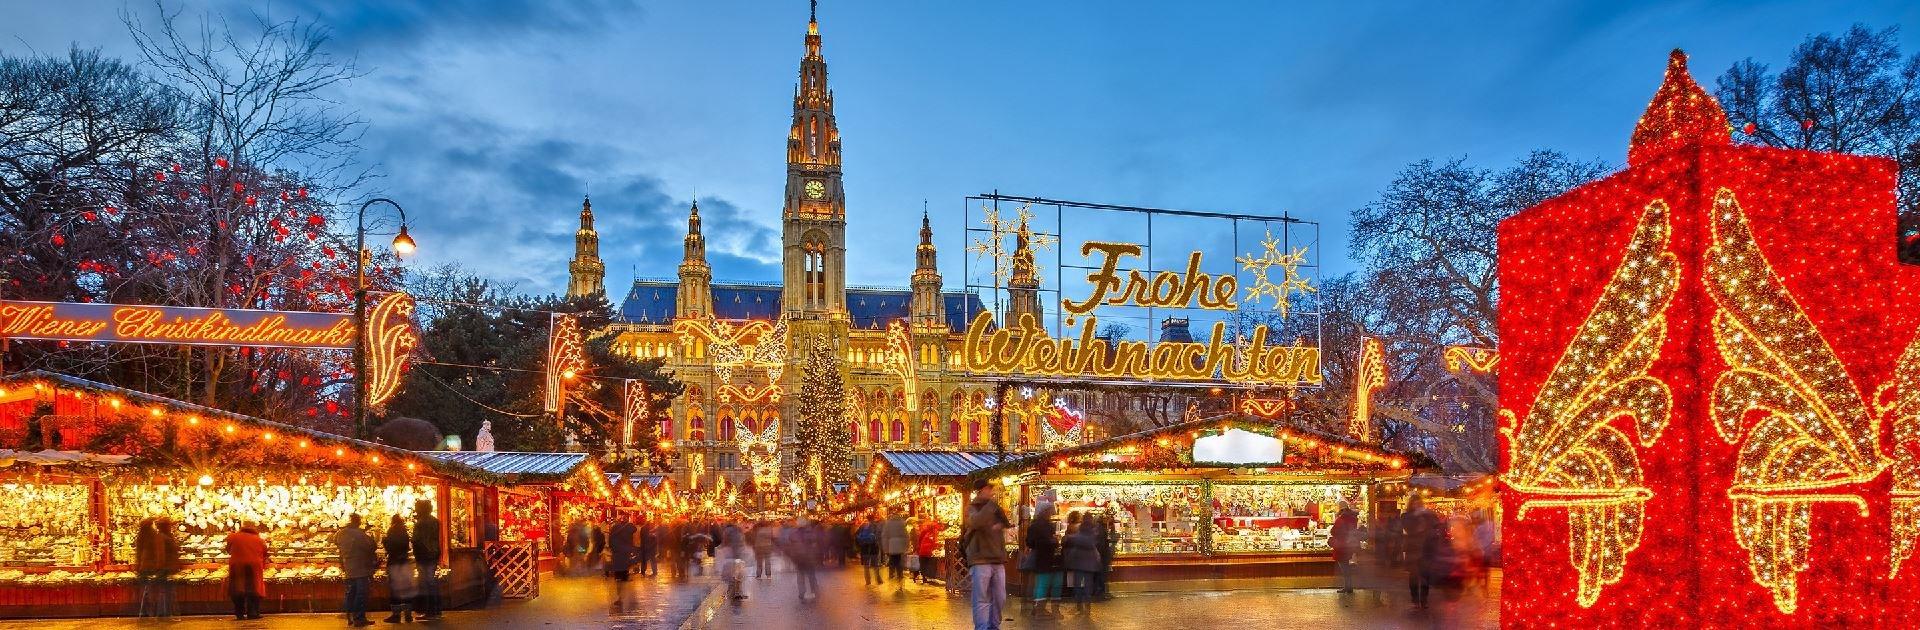 Danube Christmas Markets -